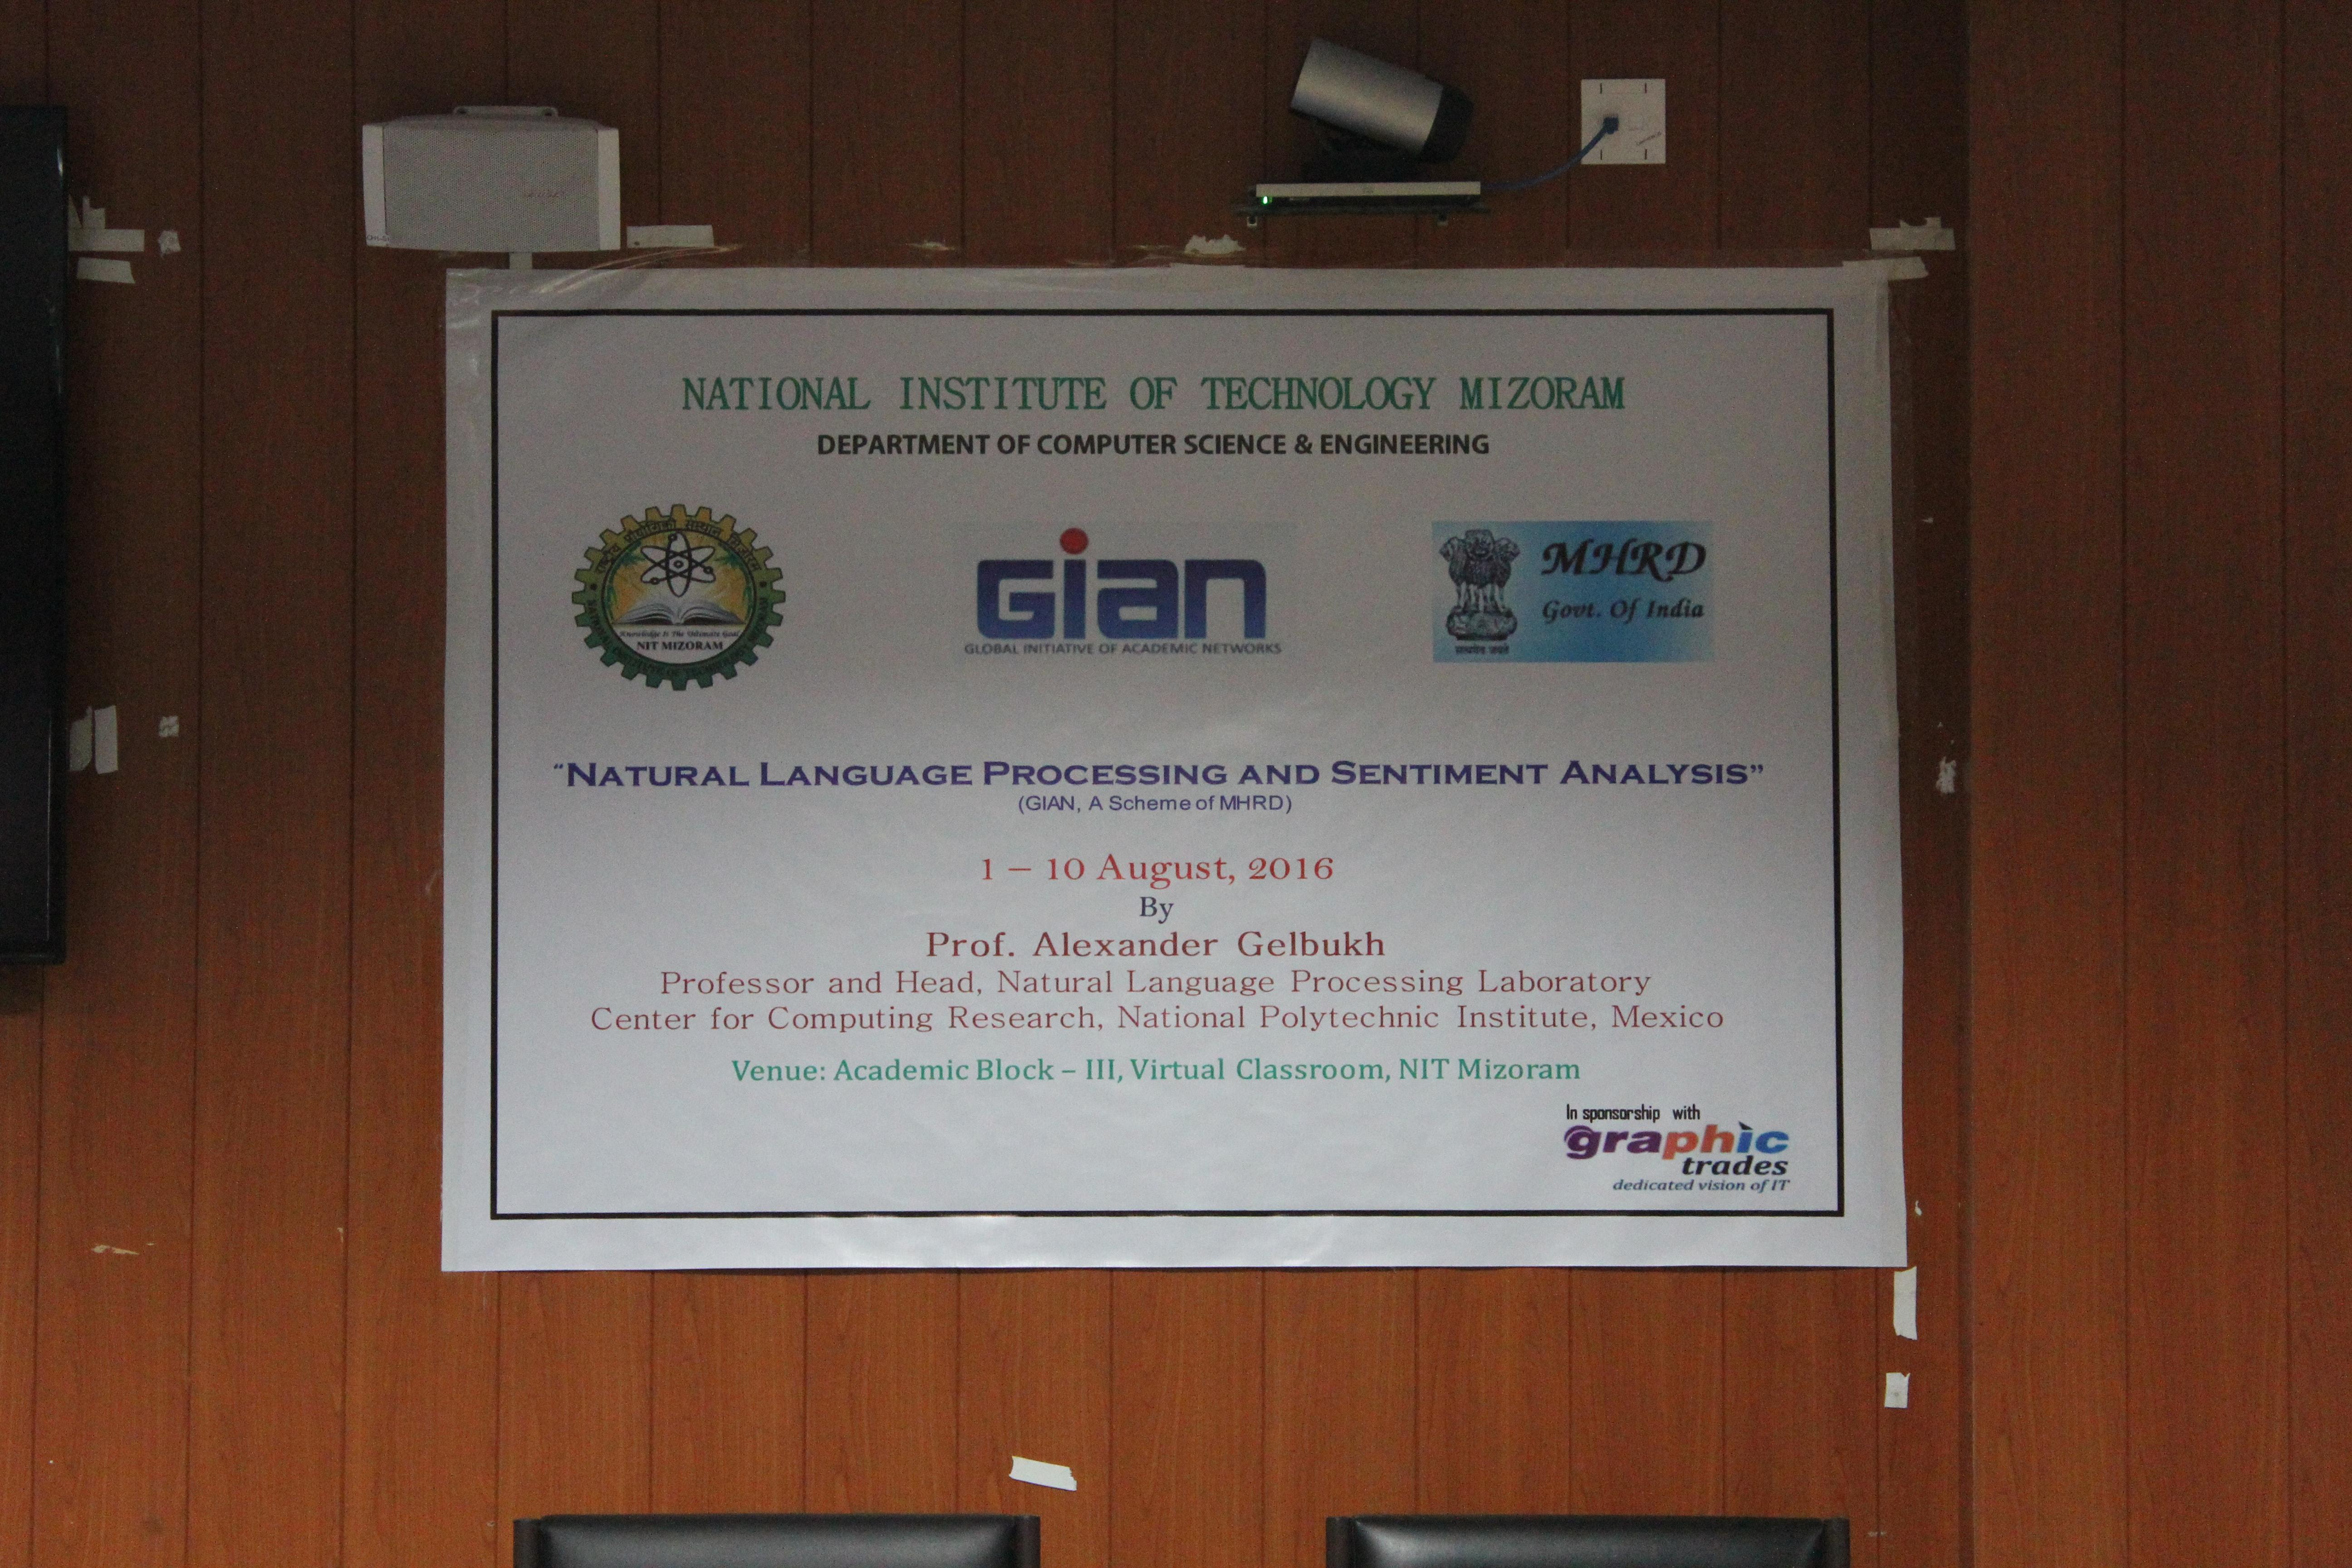 National Institute of Technology Mizoram